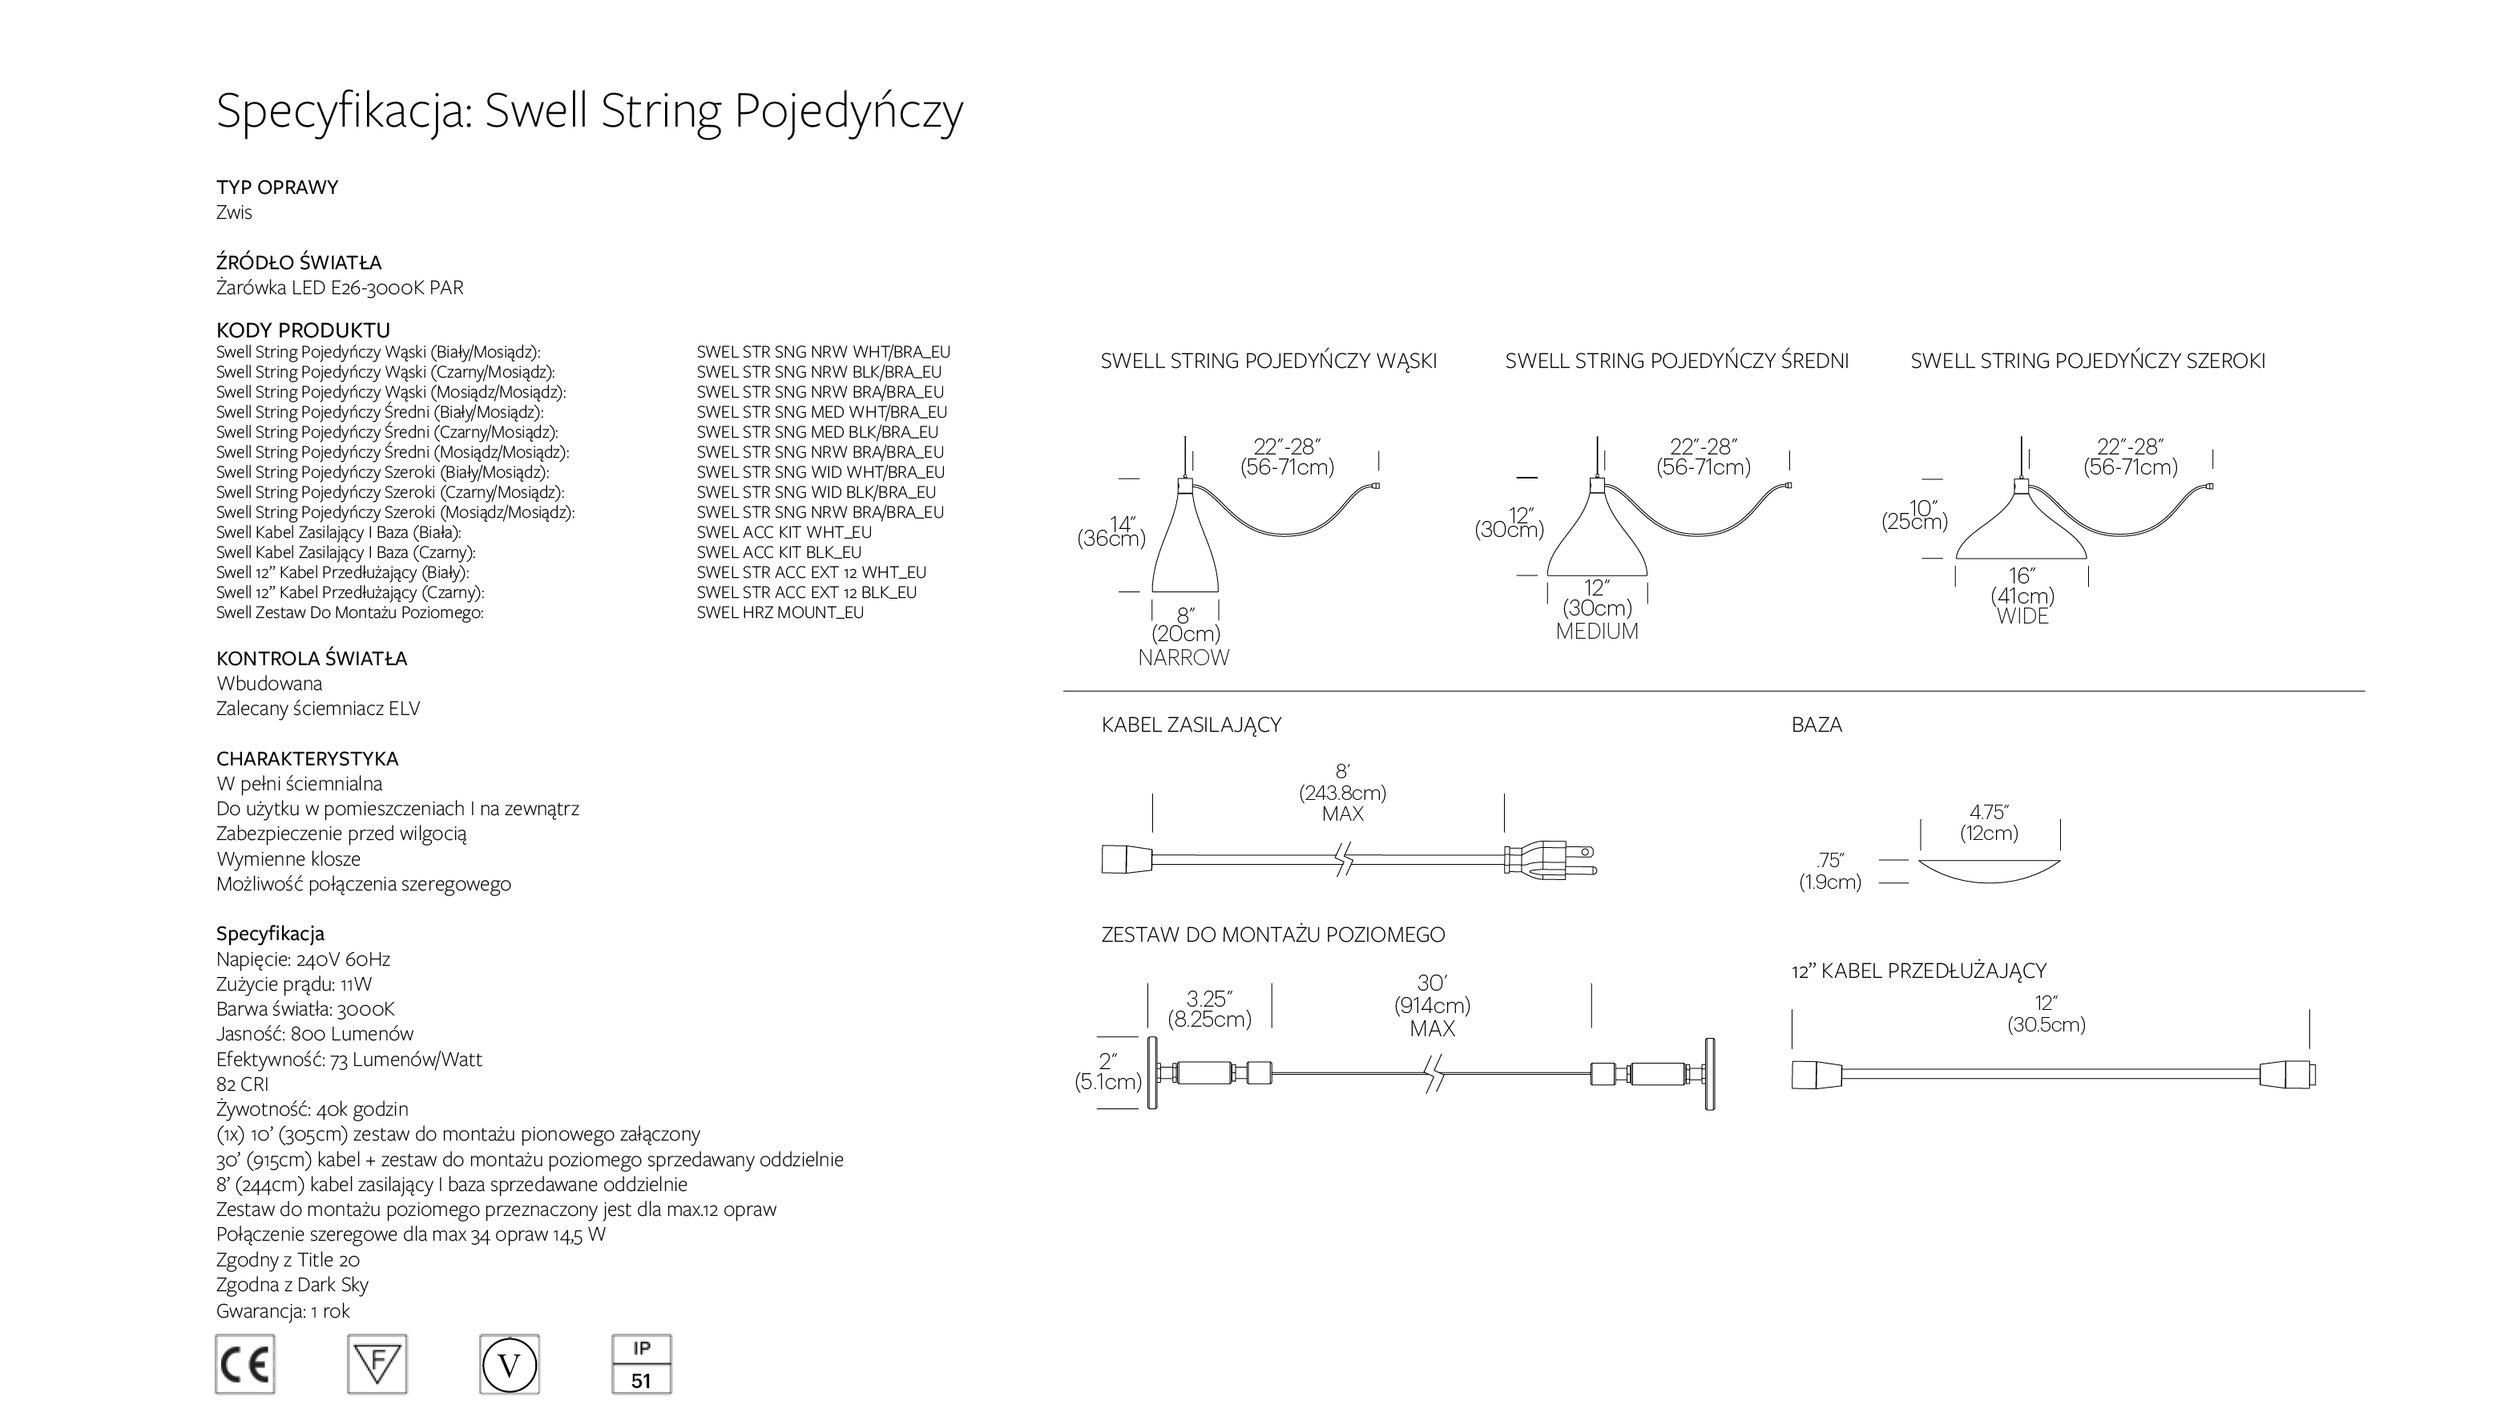 Swell String single Polish Spec_240V.jpg